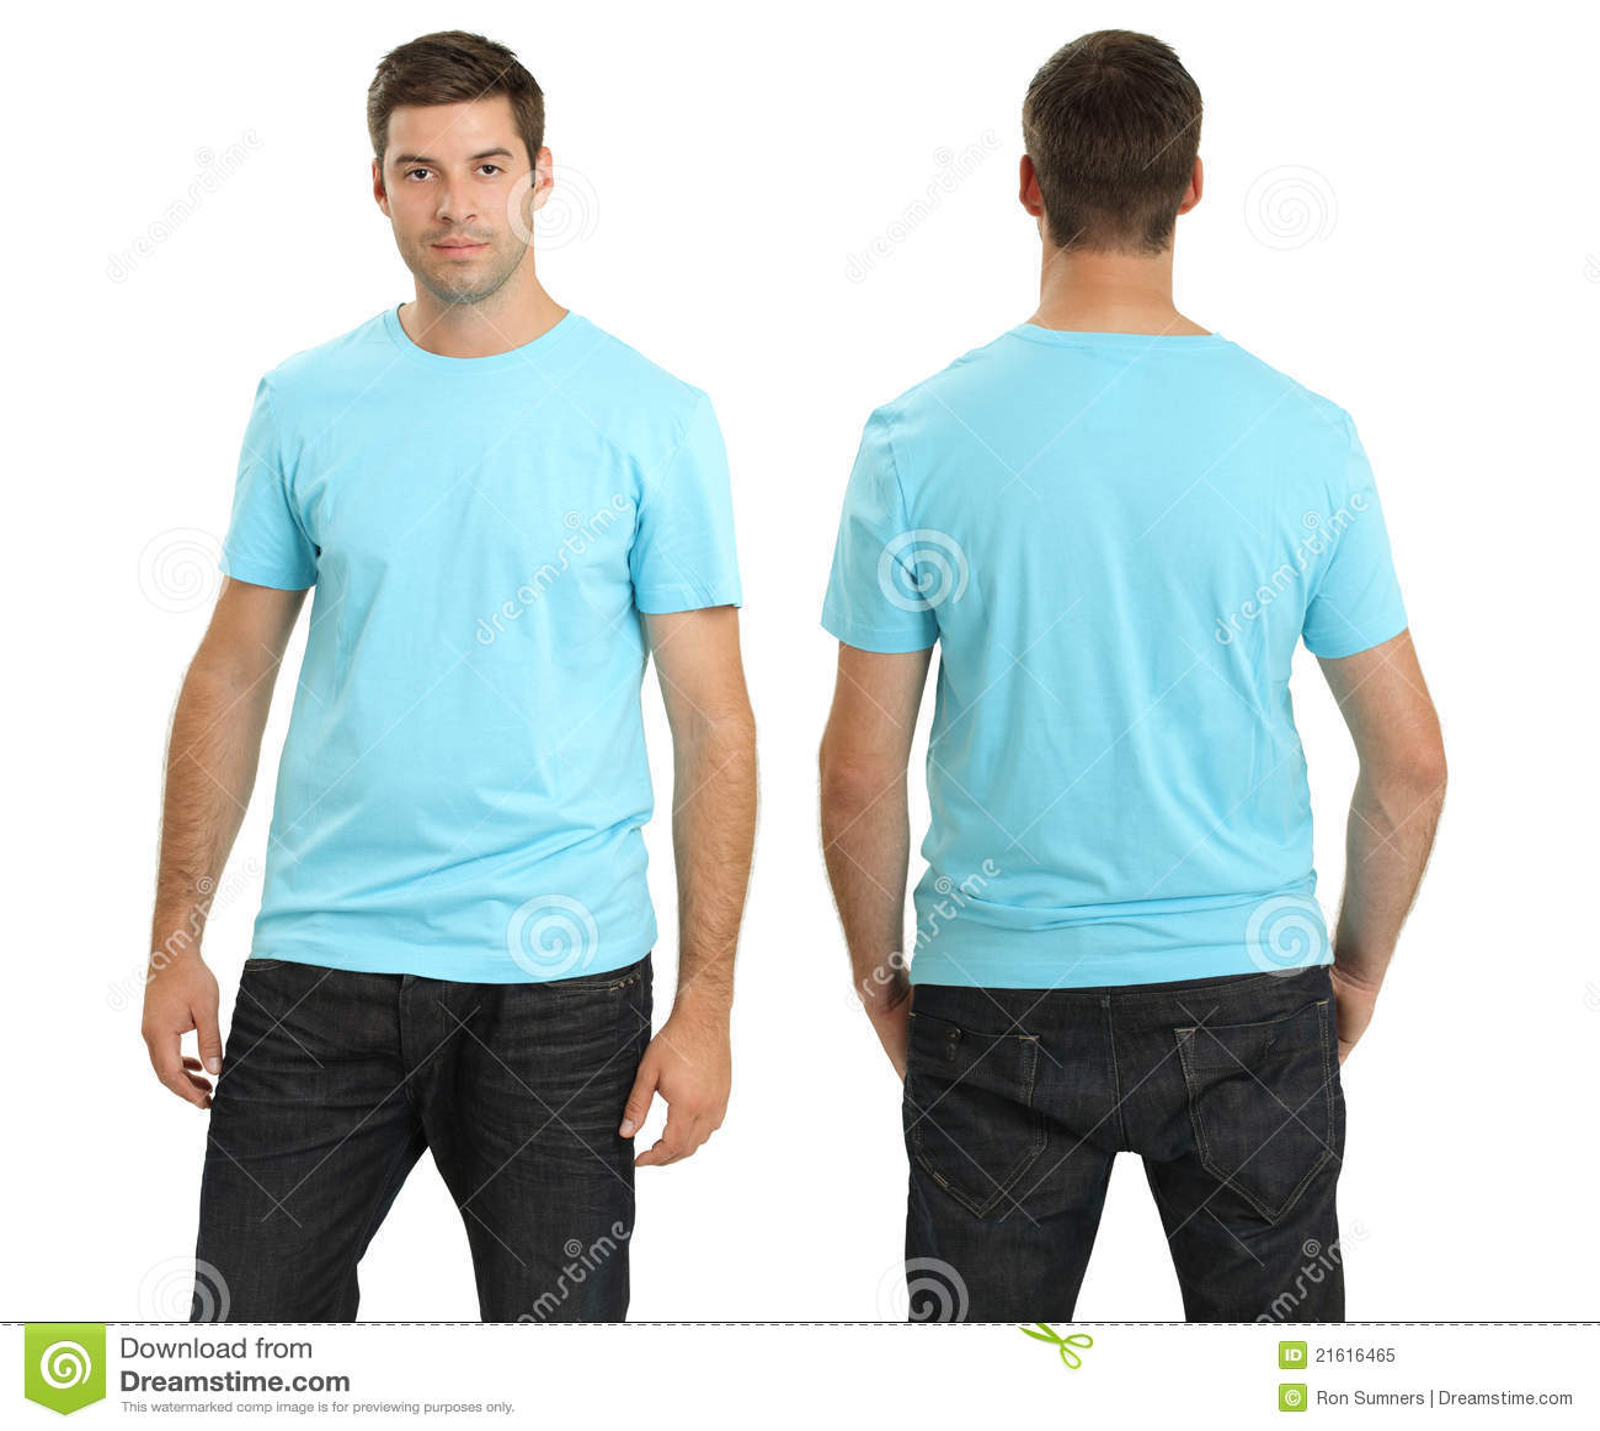 Male Wearing Blank Light Blue Shirt Stock Image